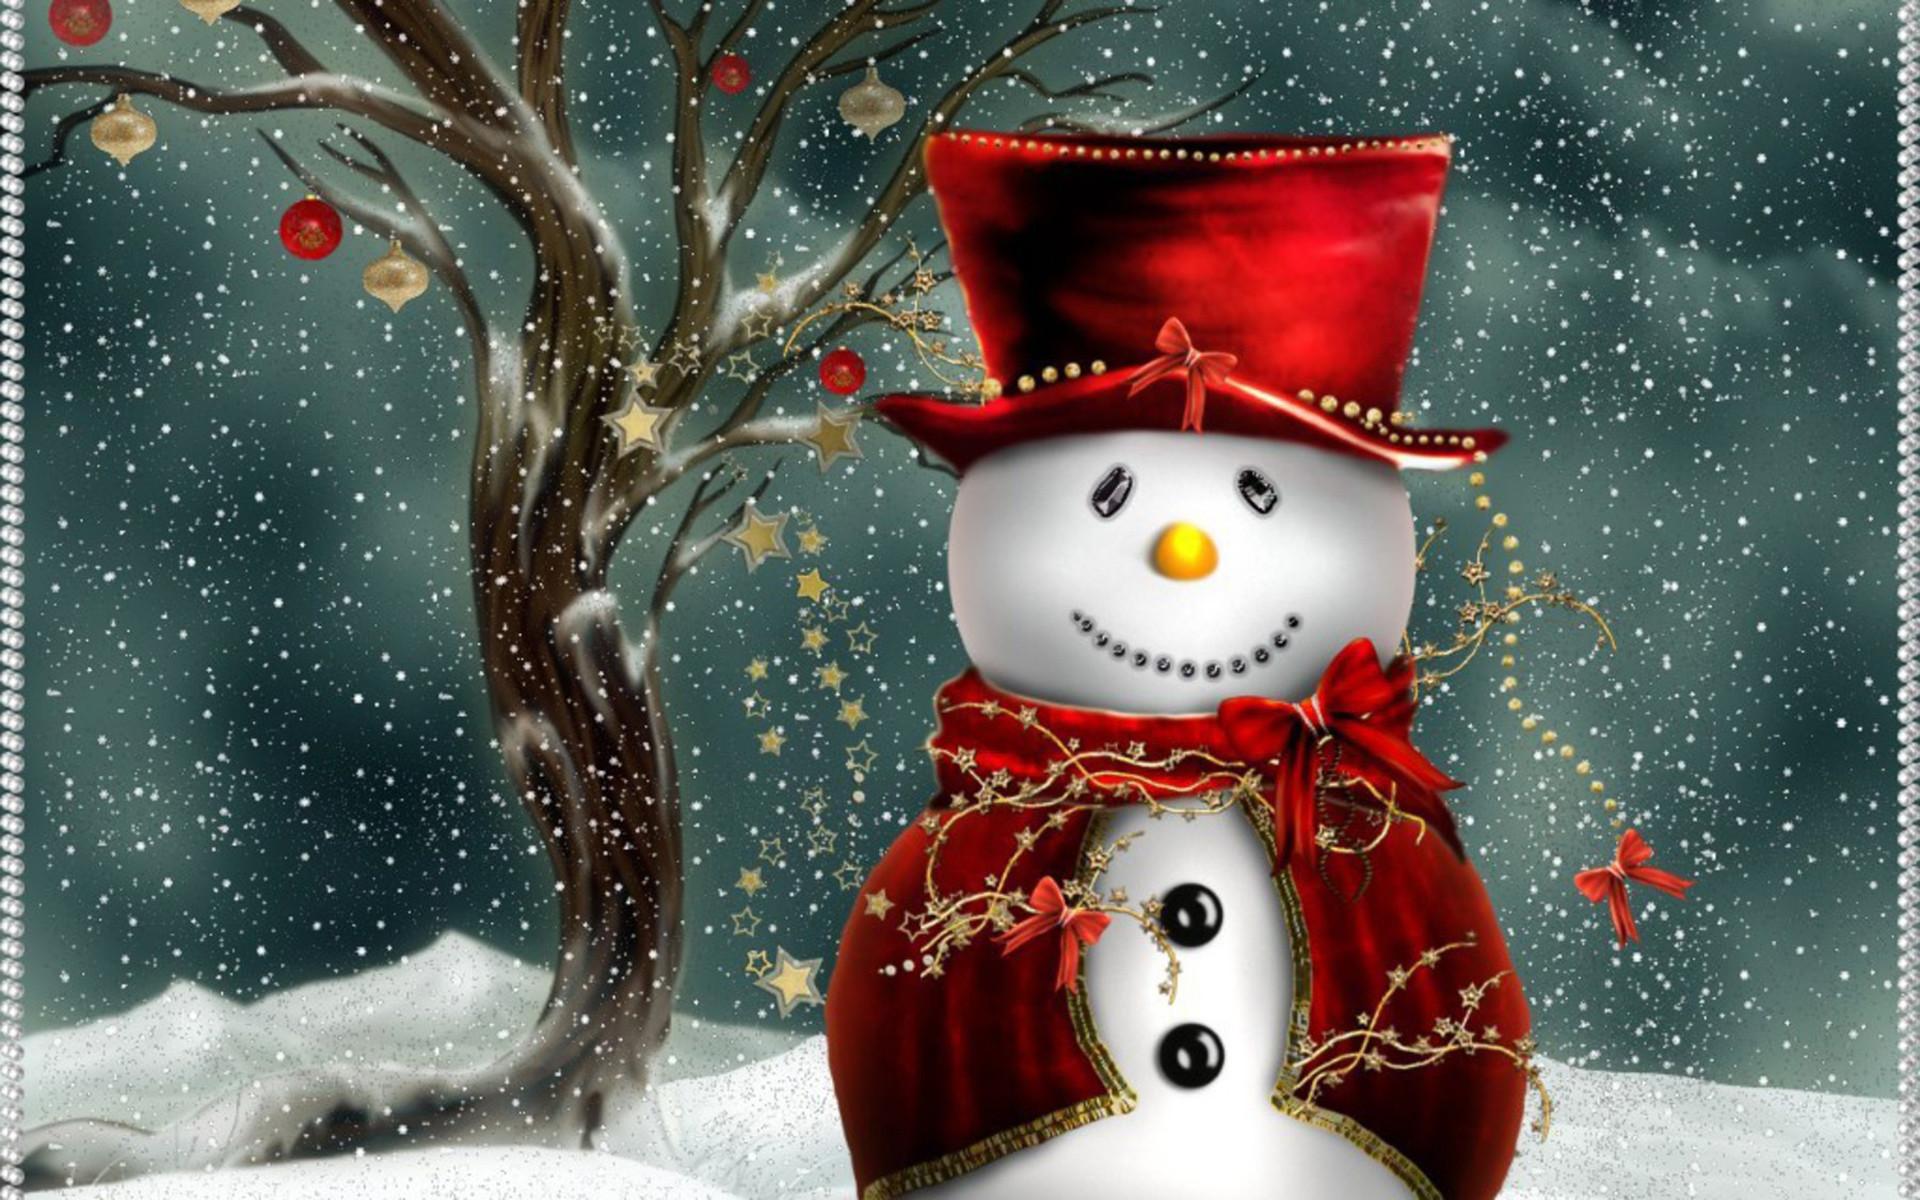 Cute Snowman Wallpaper